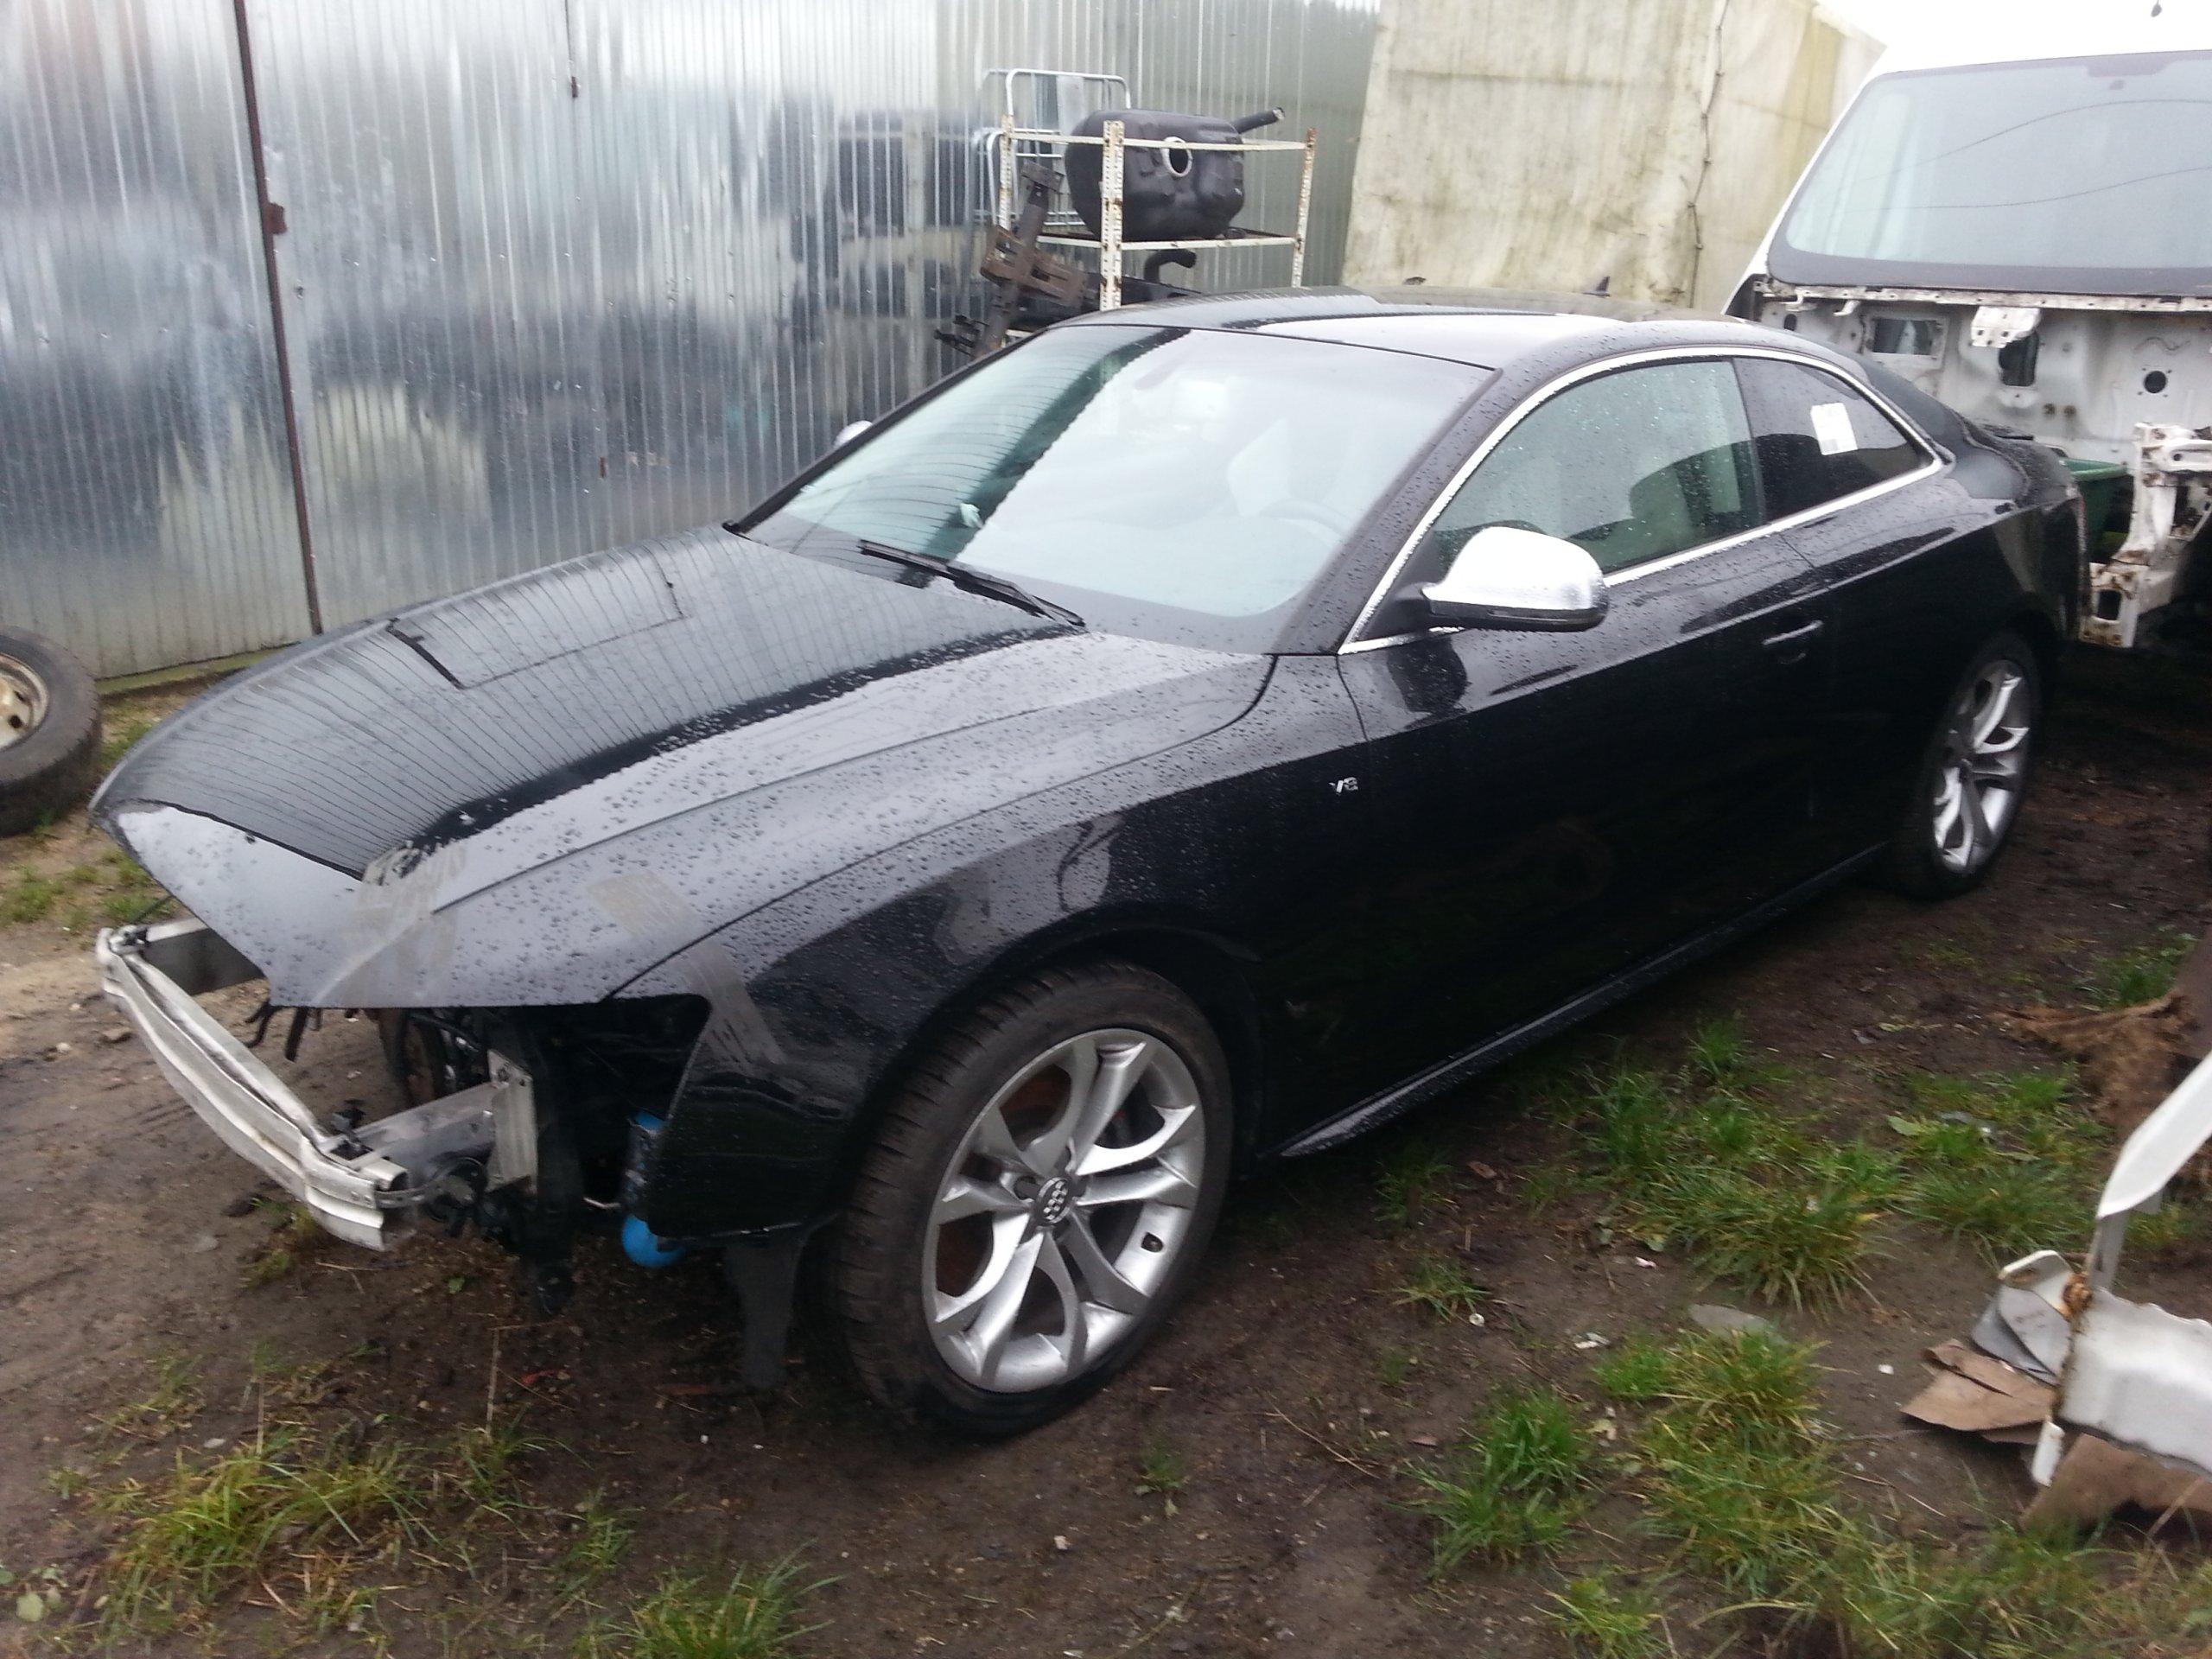 Audi S5 42 V8 A5 Coupe Na Czesci 7434873872 Oficjalne